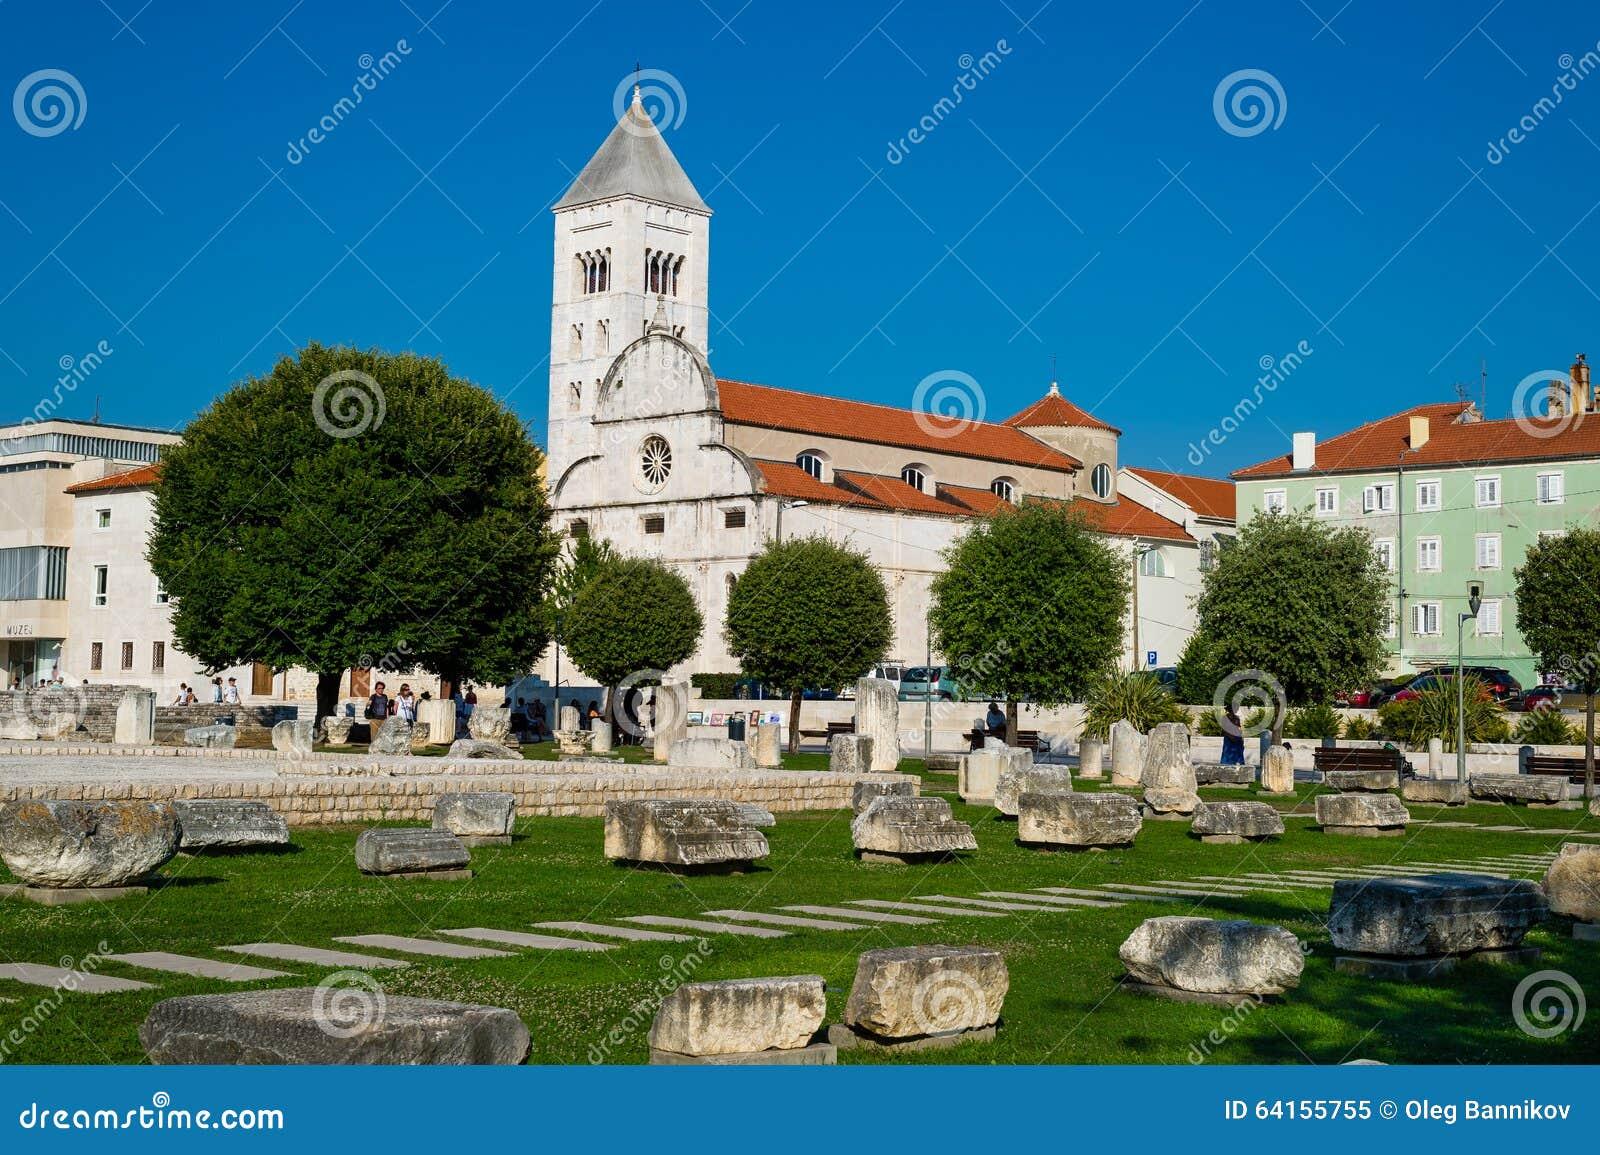 Old church and ancient ruins in Zadar, Croatia.